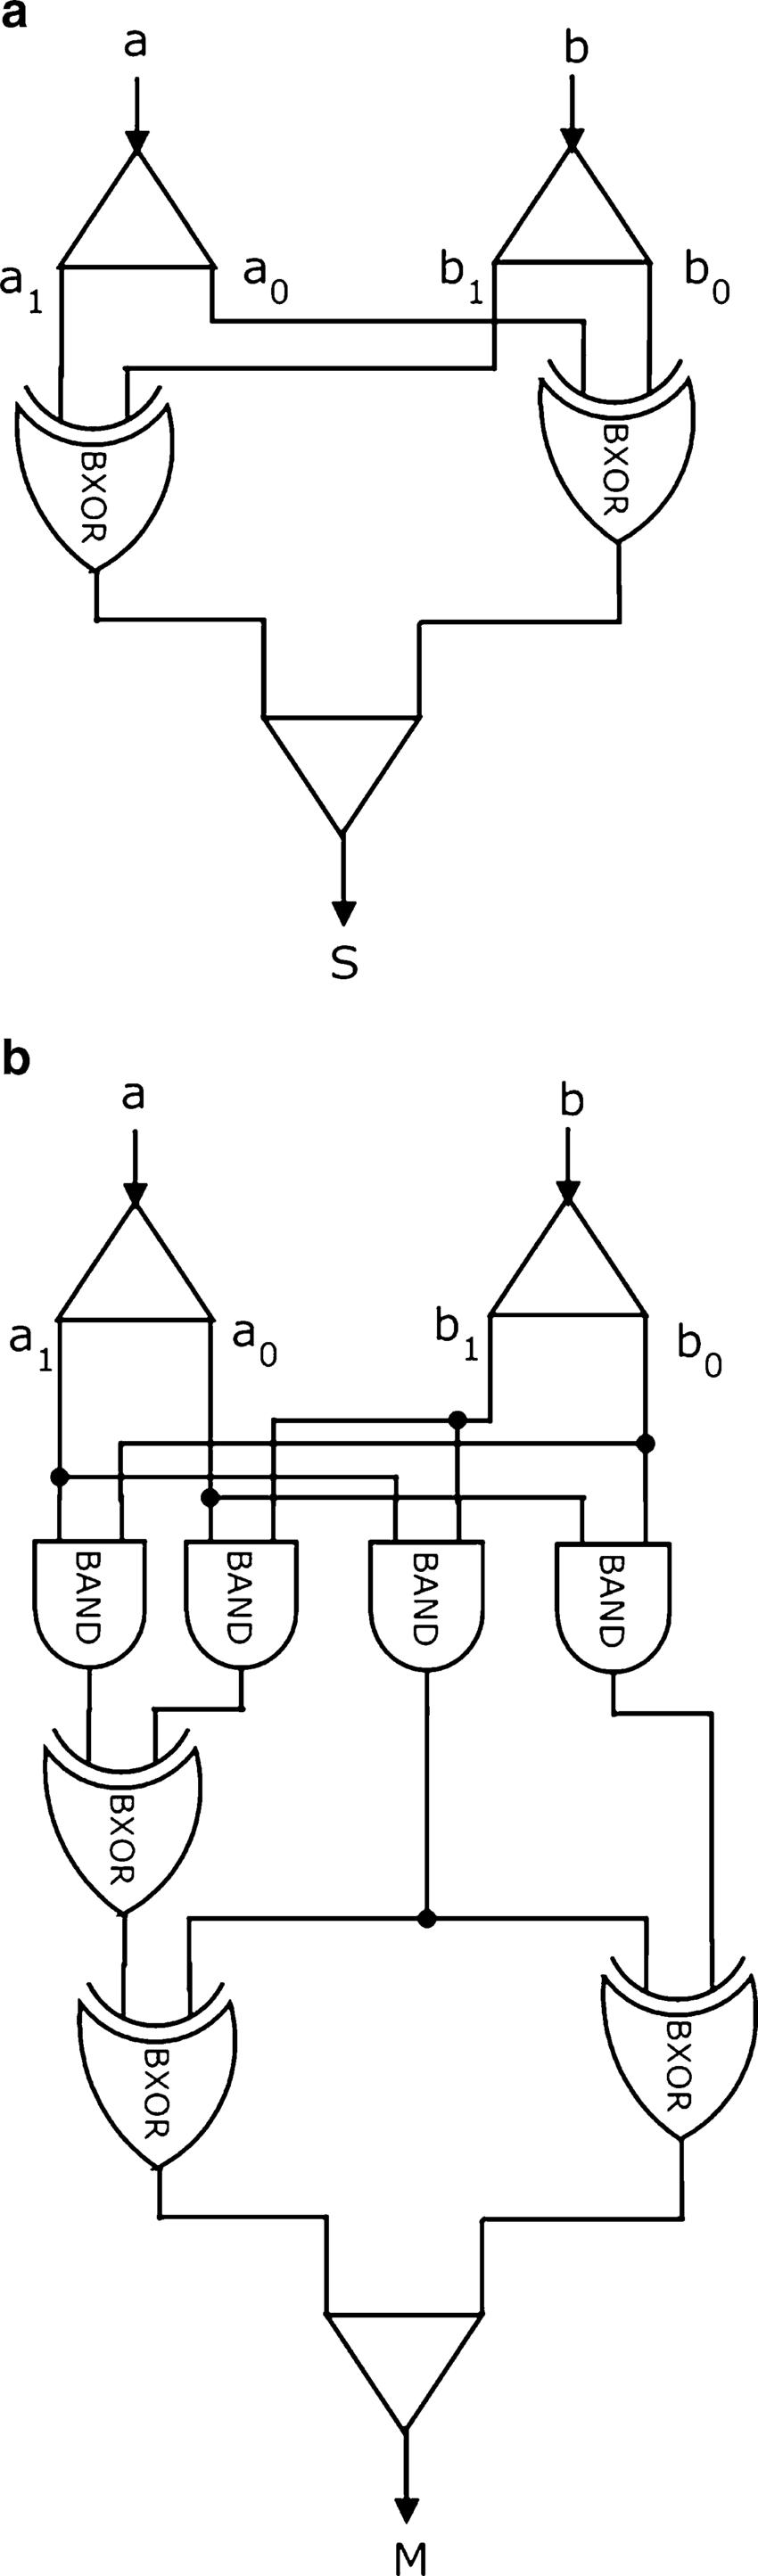 hight resolution of gf 4 a addition b multiplication circuit block diagram bxor binary xor gate